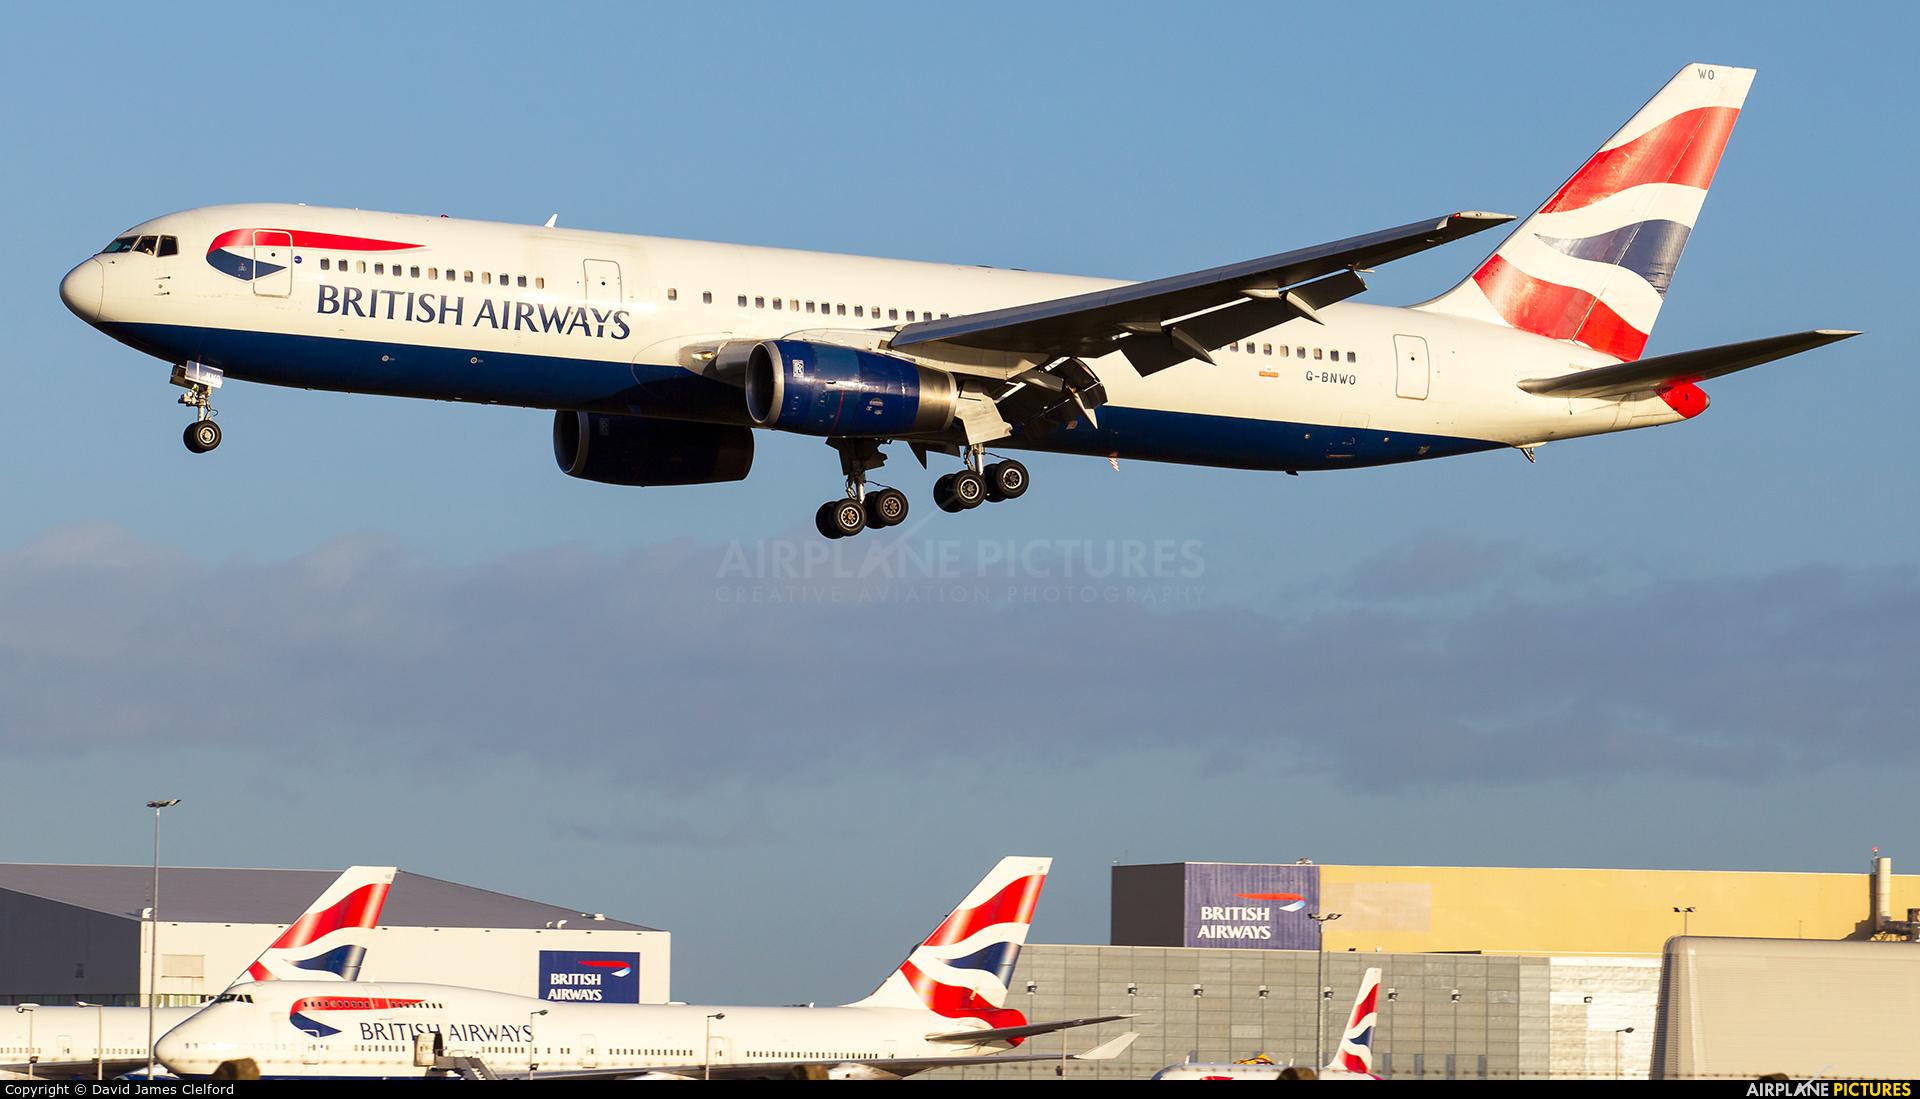 British Airways G-BNWO aircraft at London - Heathrow